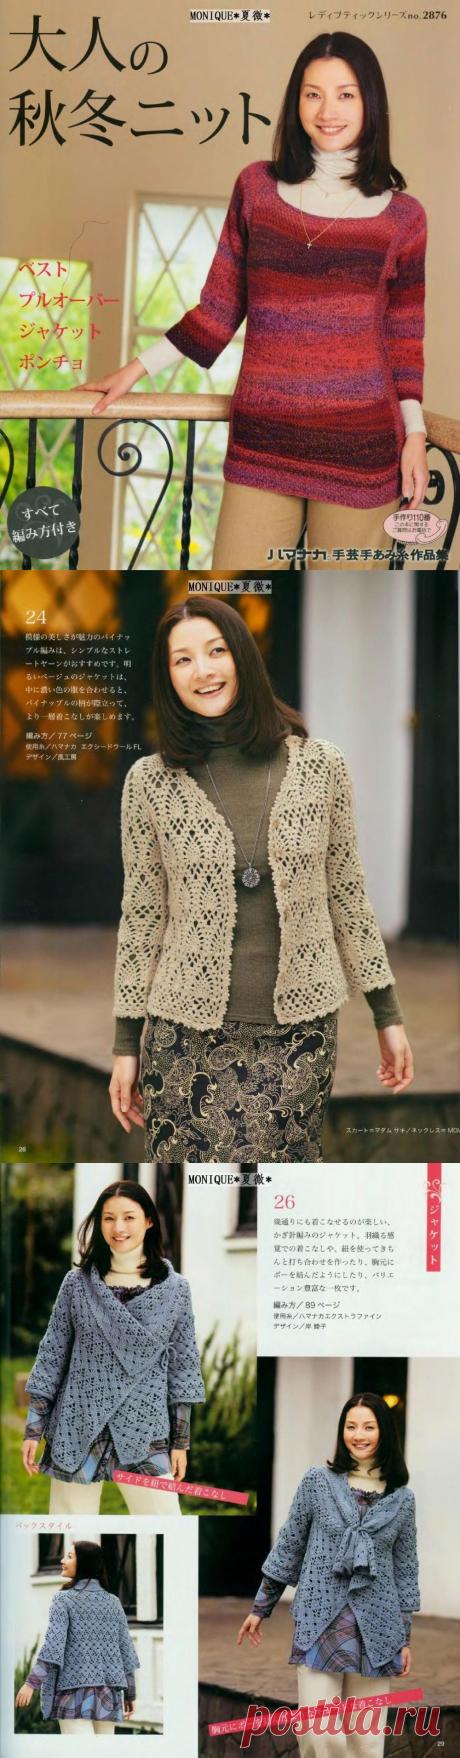 "Журнал ""Lets knit series"" NV2876 2009г"